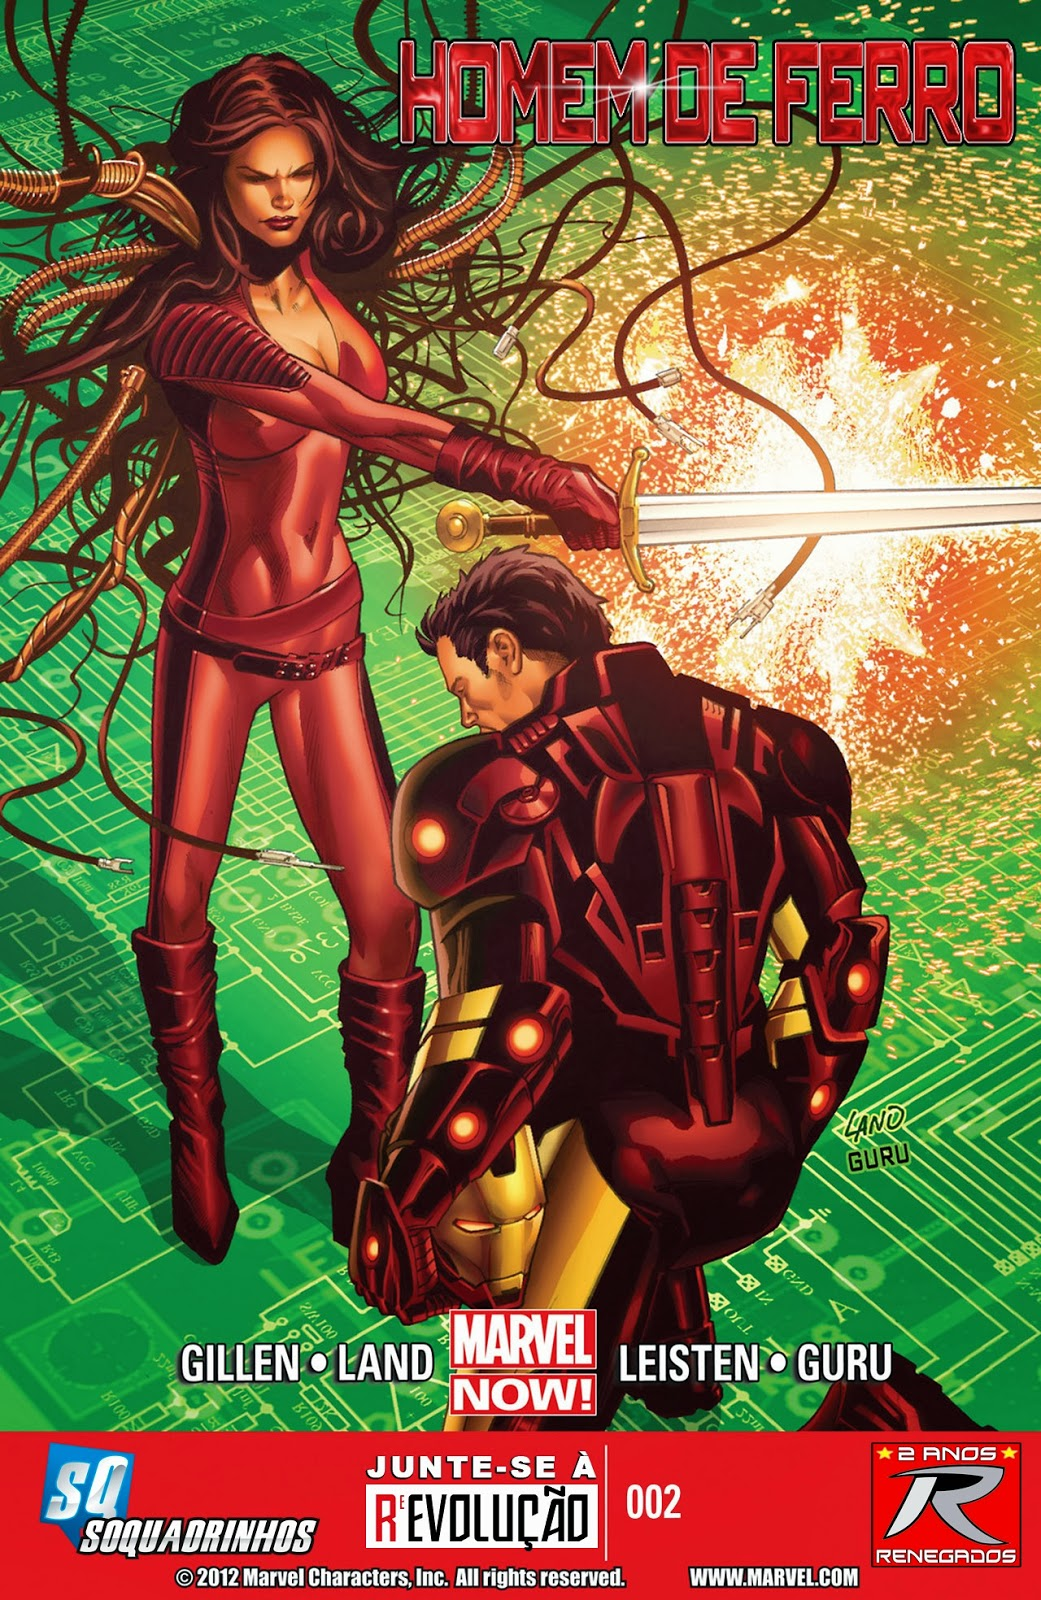 Nova Marvel! Homem de Ferro v6 #2